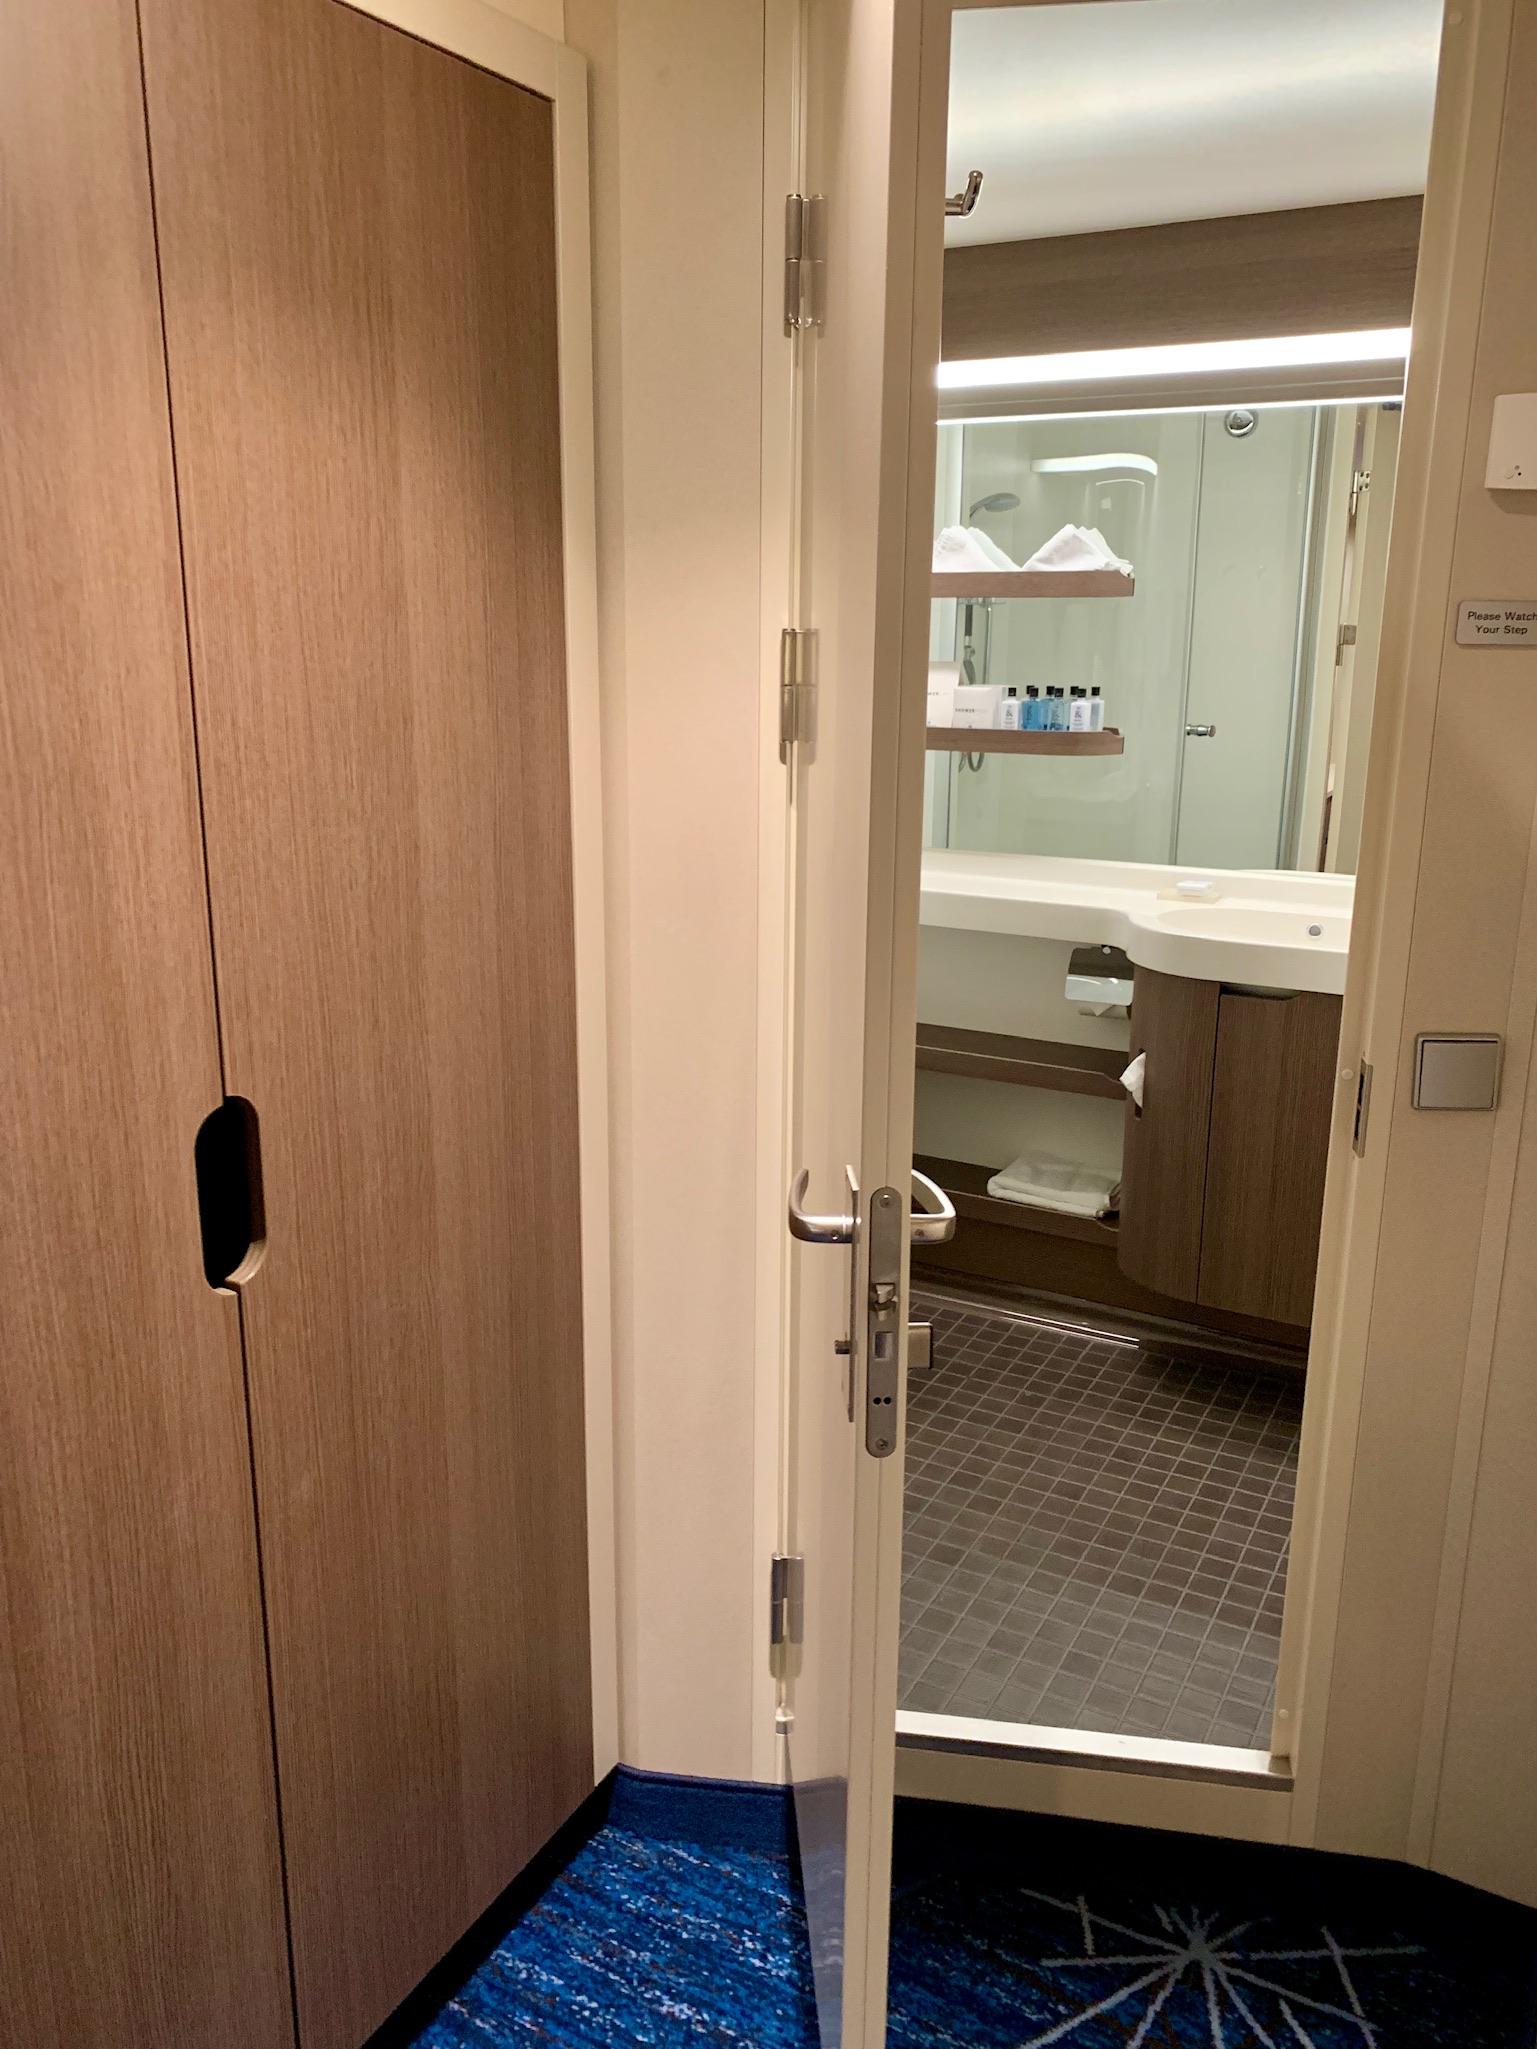 NCL Joy Room Concierge Family Inside Second bedroom bath.jpg